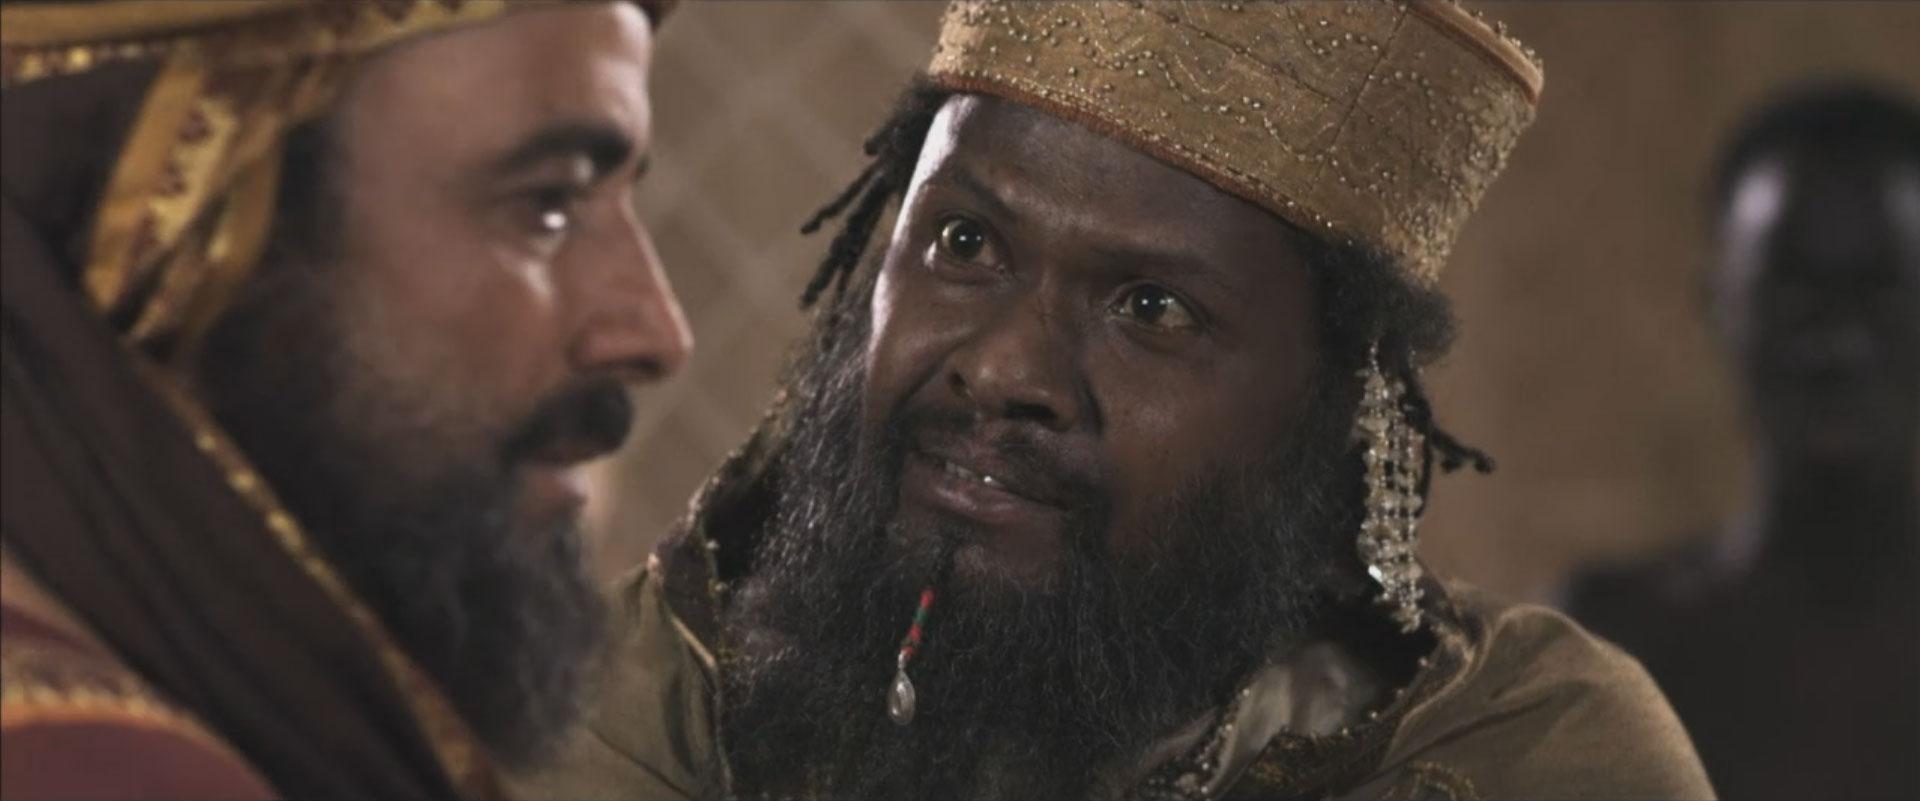 Omar Ibn Khattab Episode 9